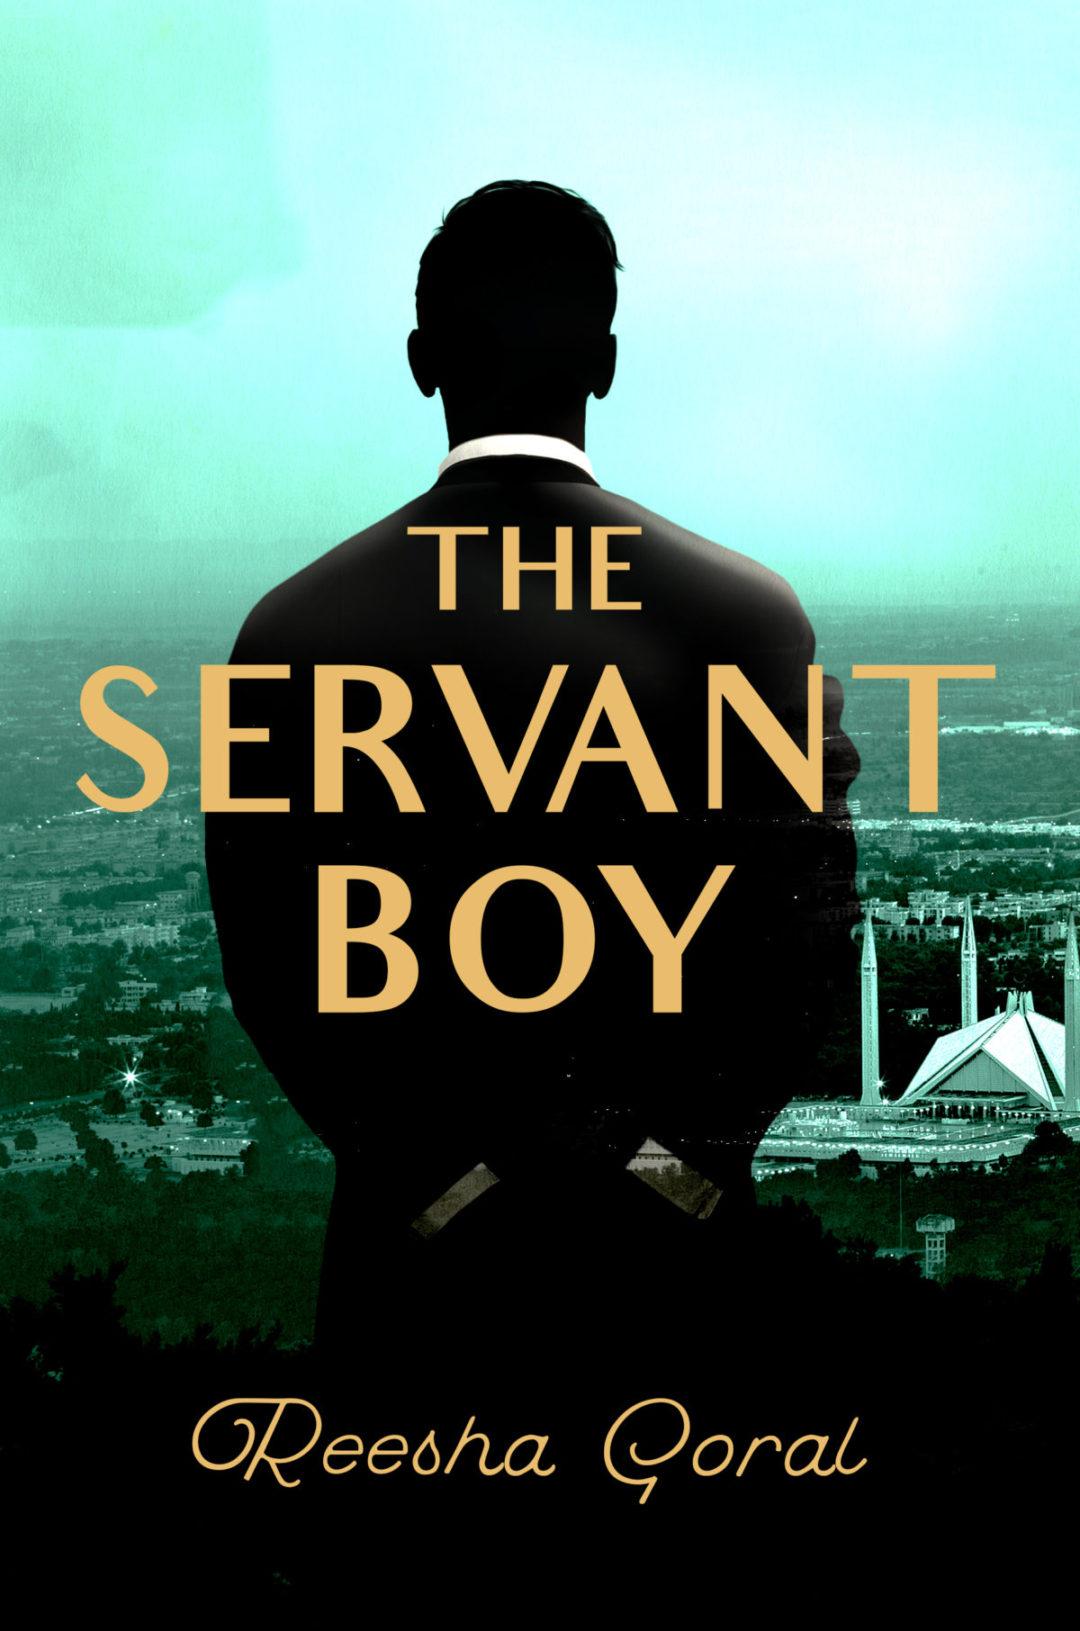 The Servant Boy